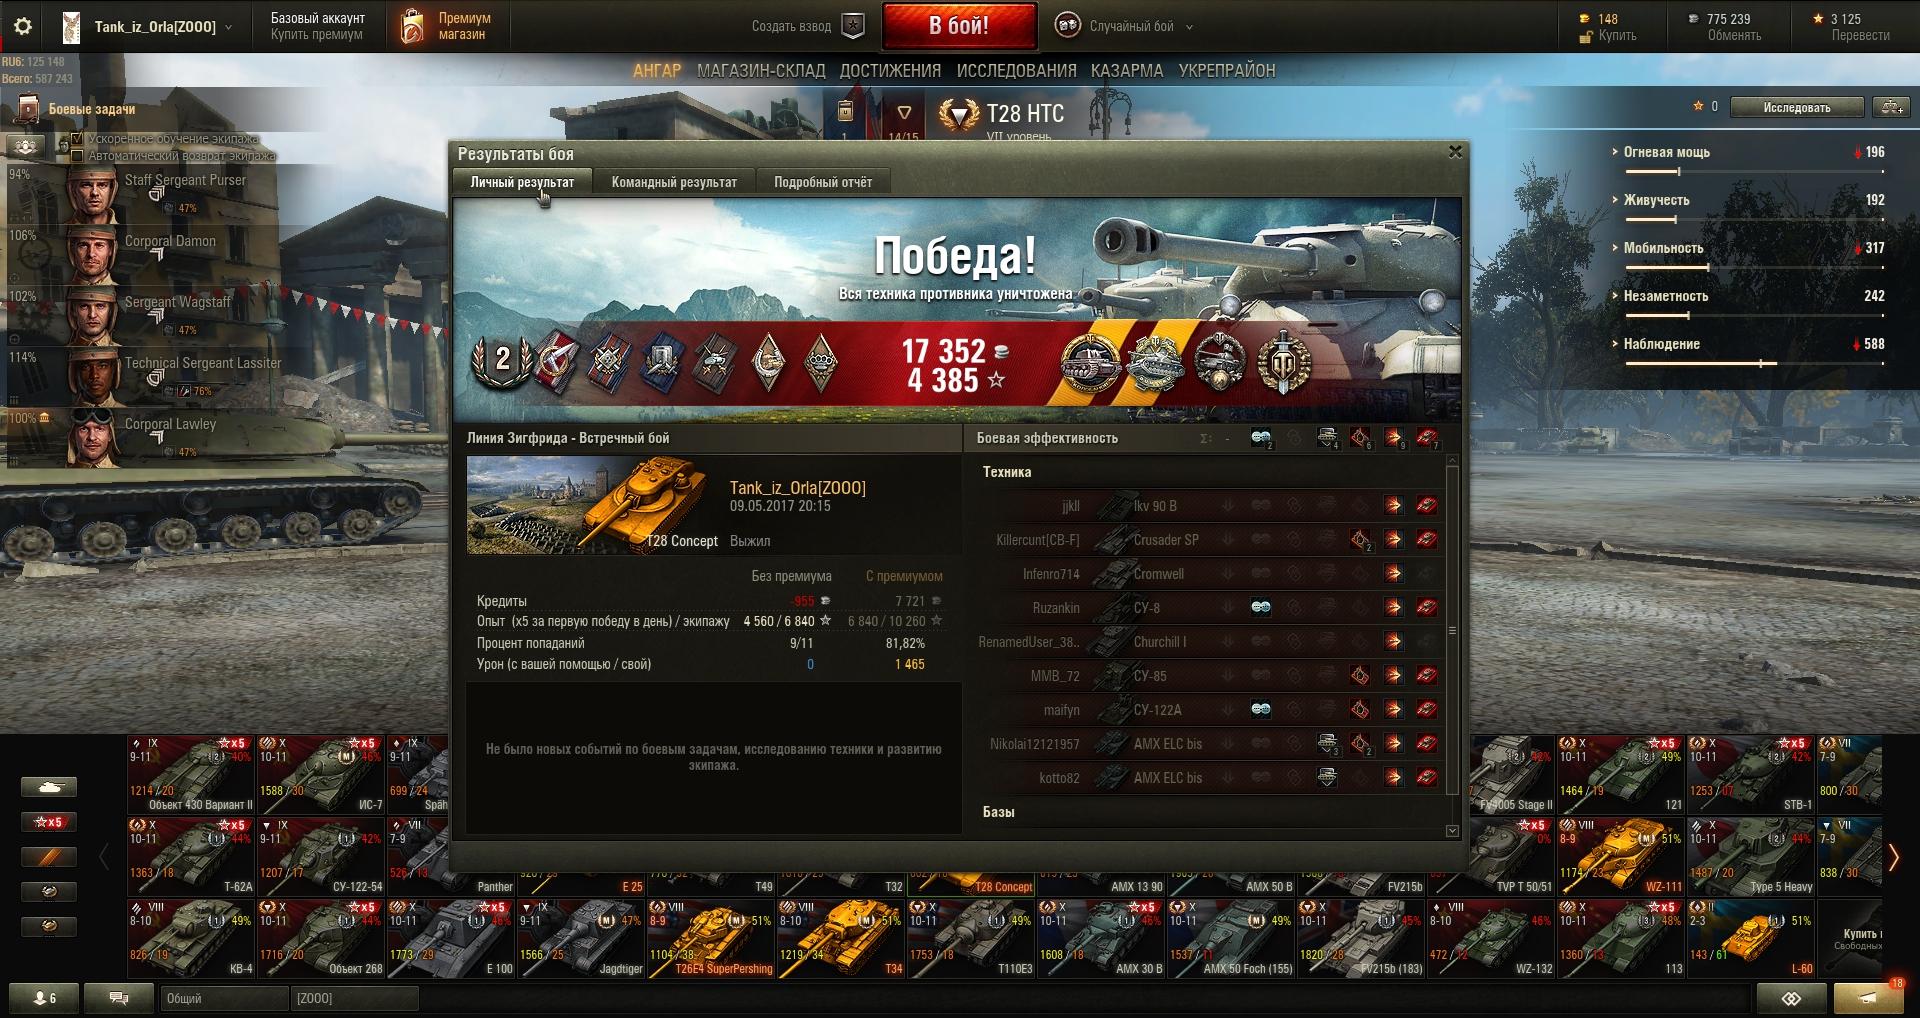 Снова нагибы - World of Tanks мастер воин куча медалек, отметка на пушке, рак